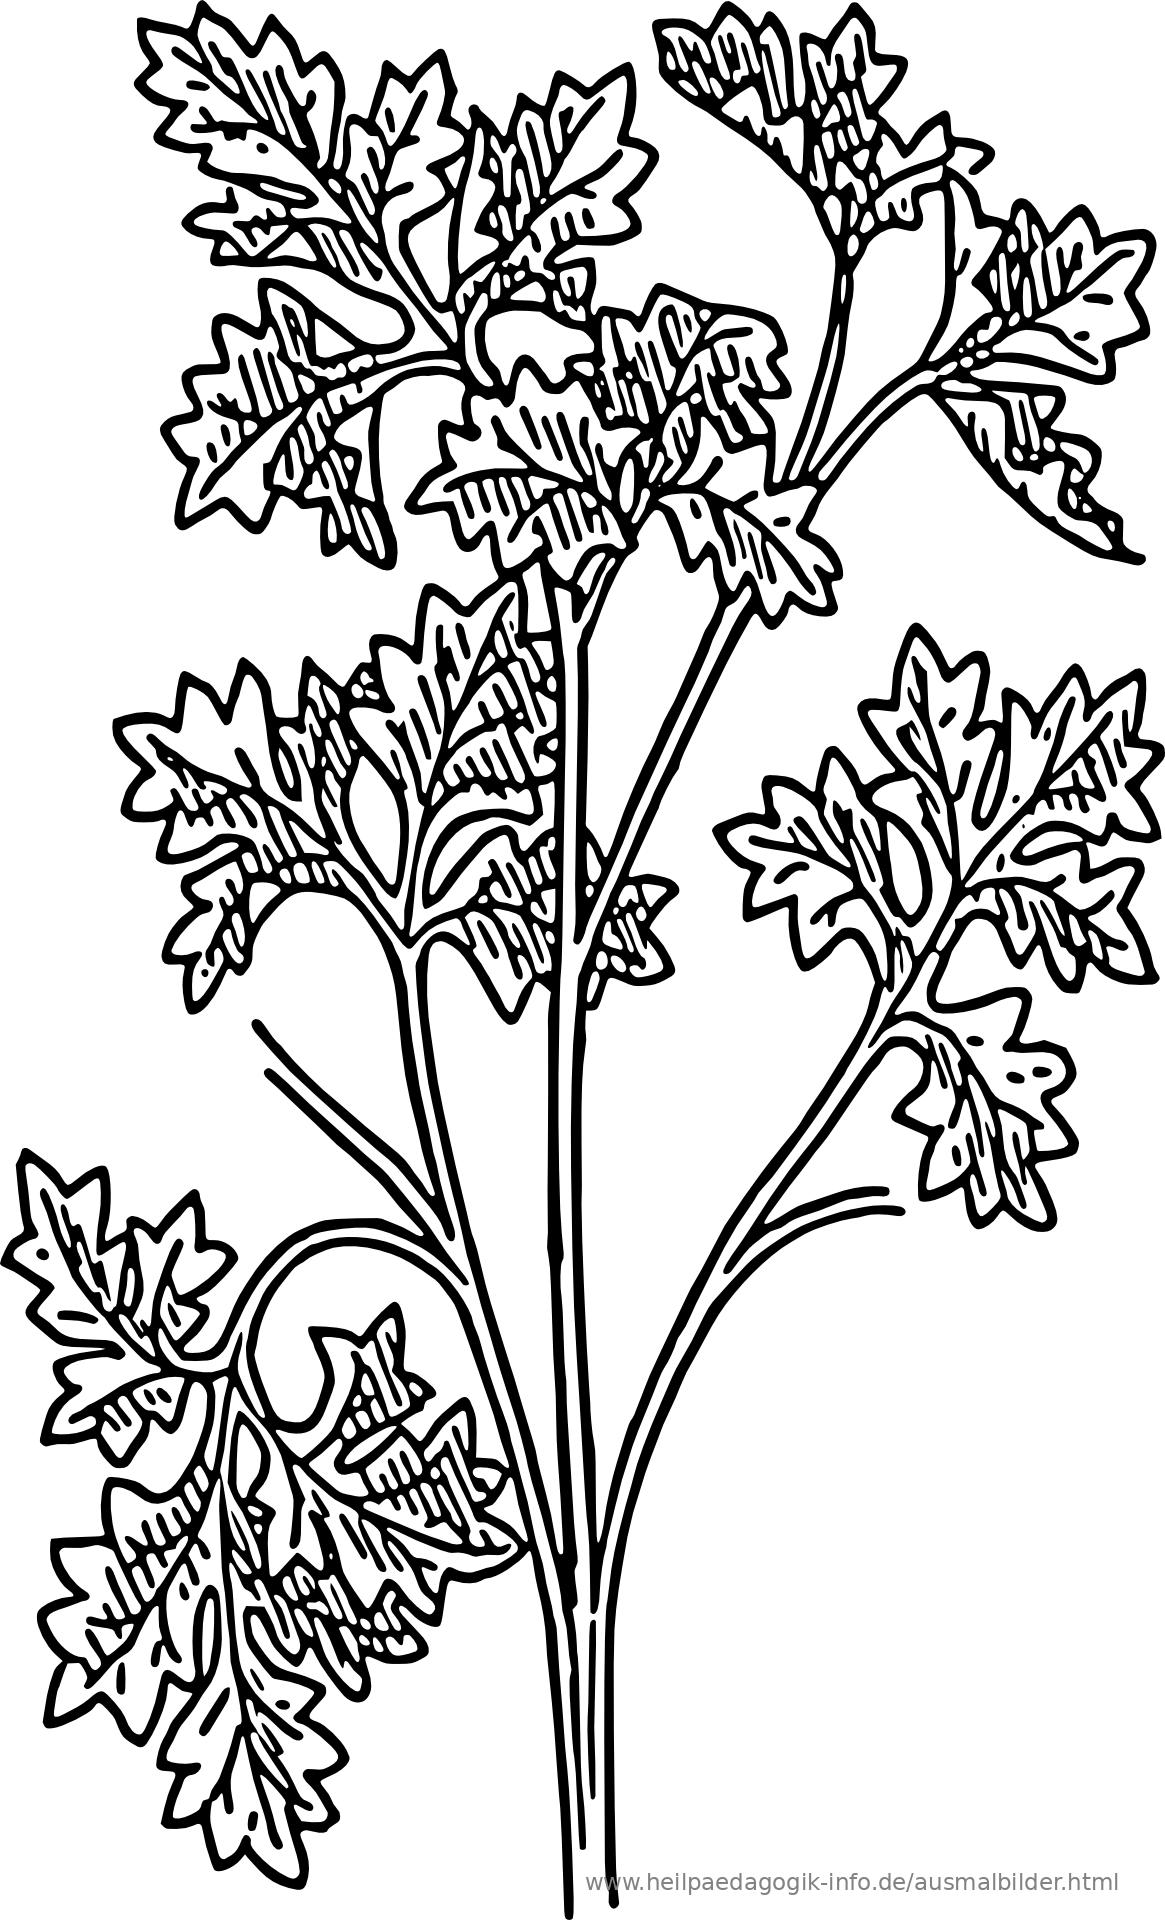 Ausmalbilder Blumen | heimhifi.com